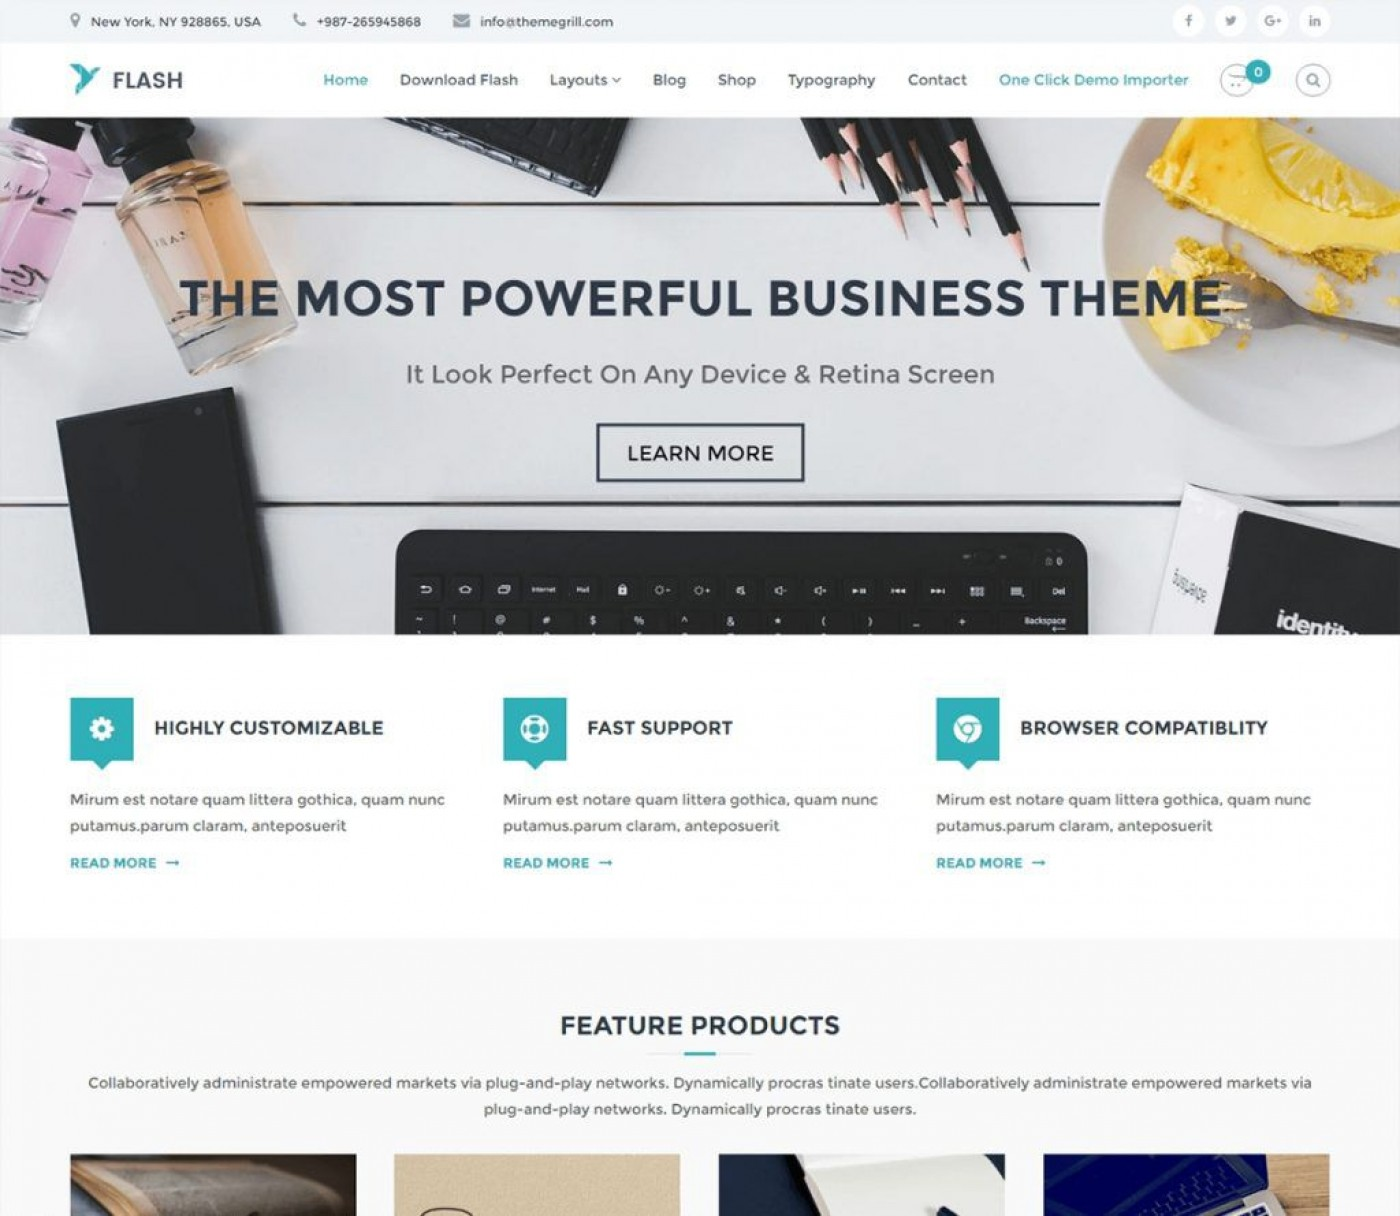 003 Astounding Professional Busines Website Template Free Download Wordpres Image 1400